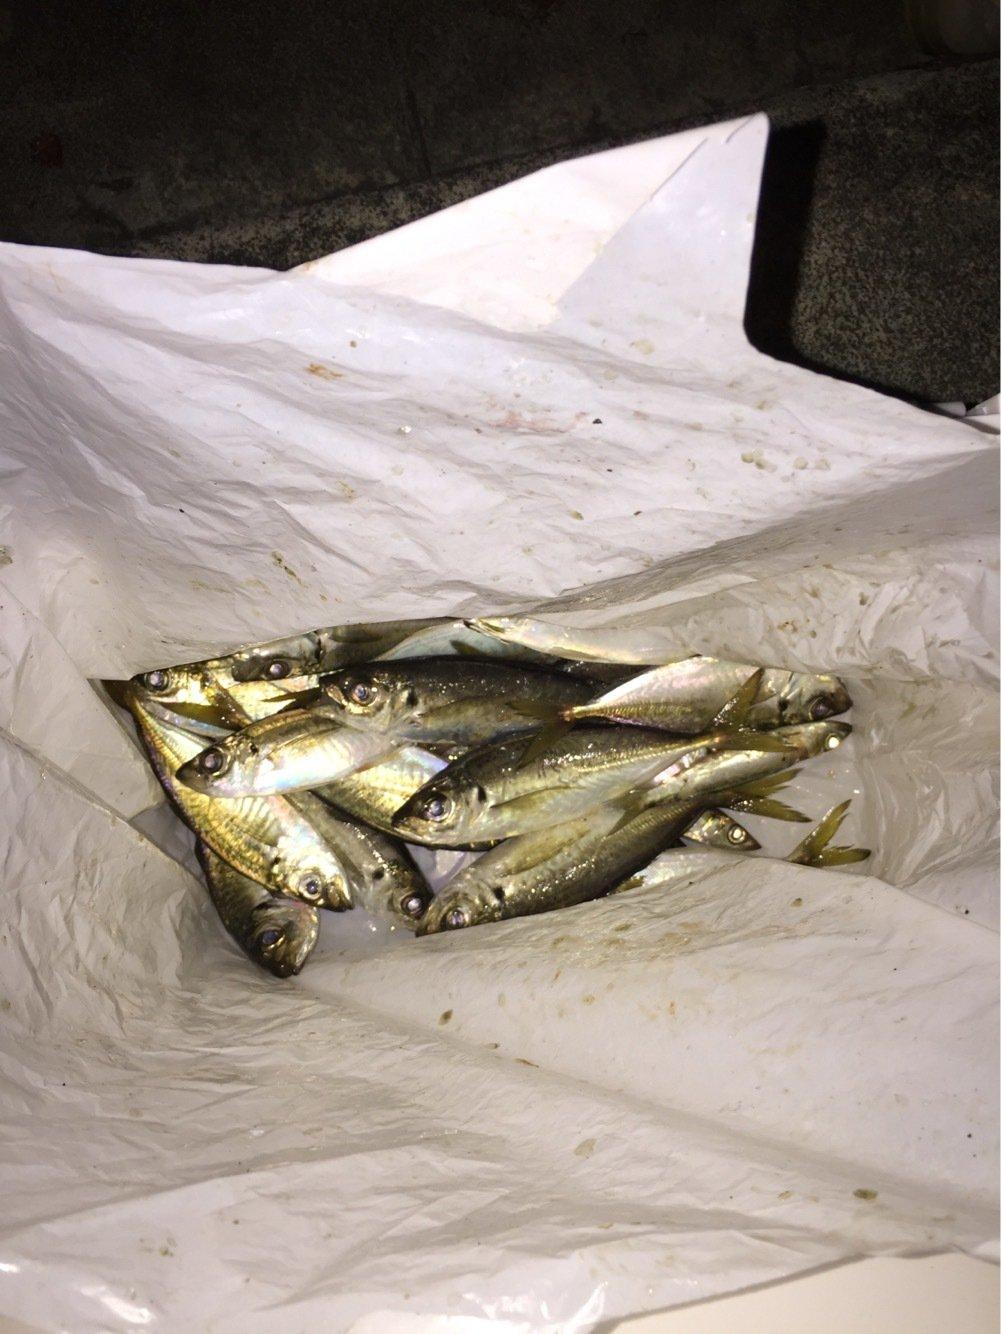 trumpeterhiro さんの投稿画像,写っている魚はアジ